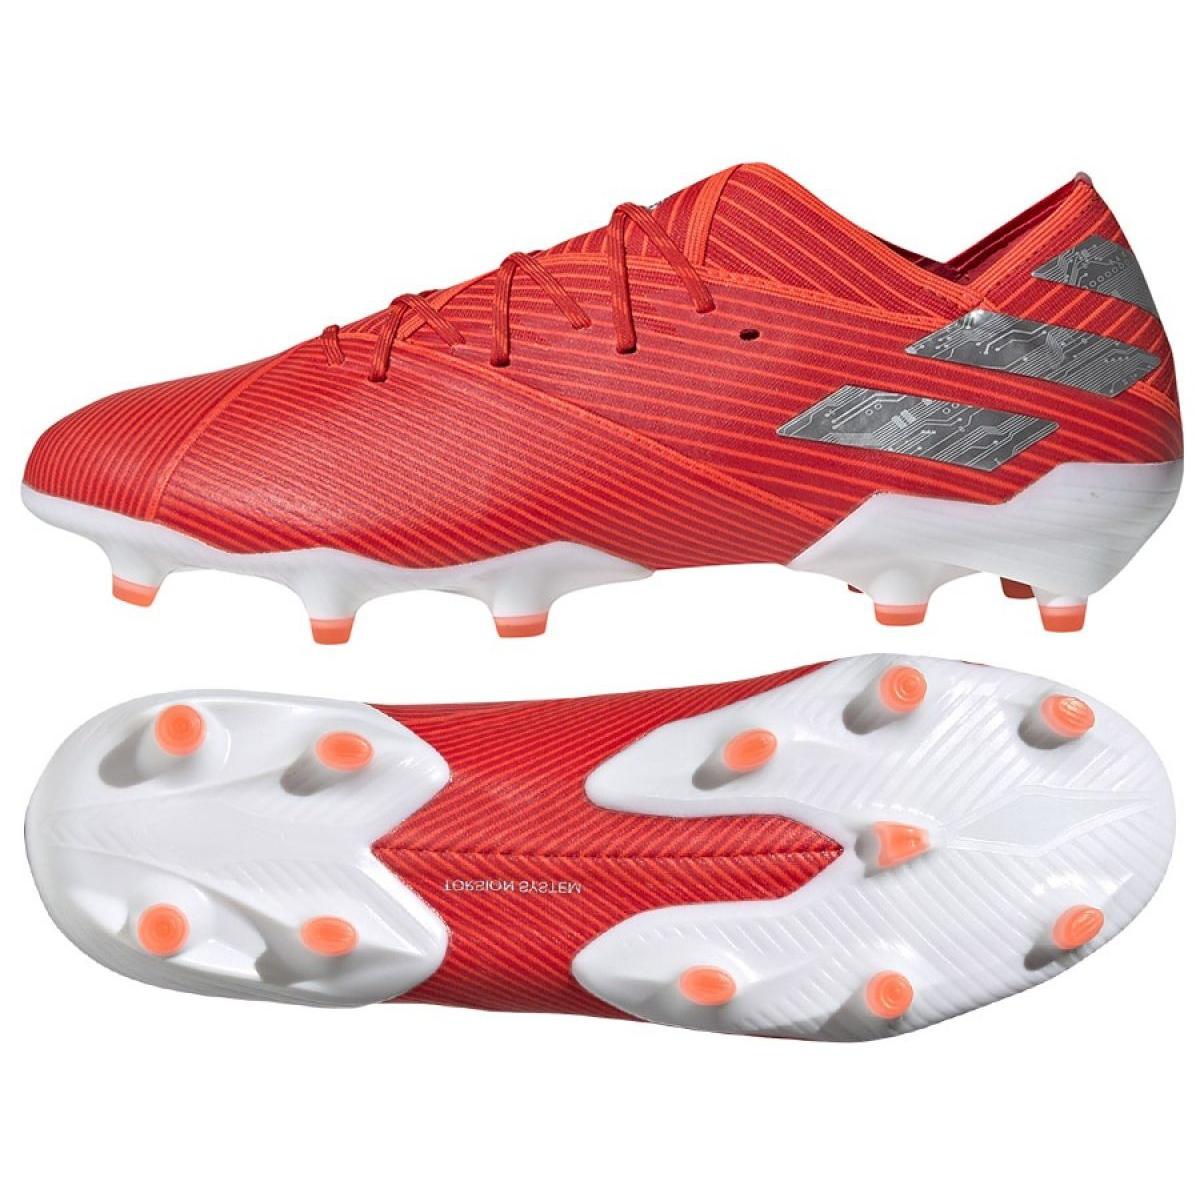 chaussure de foot homme adidas nemeziz